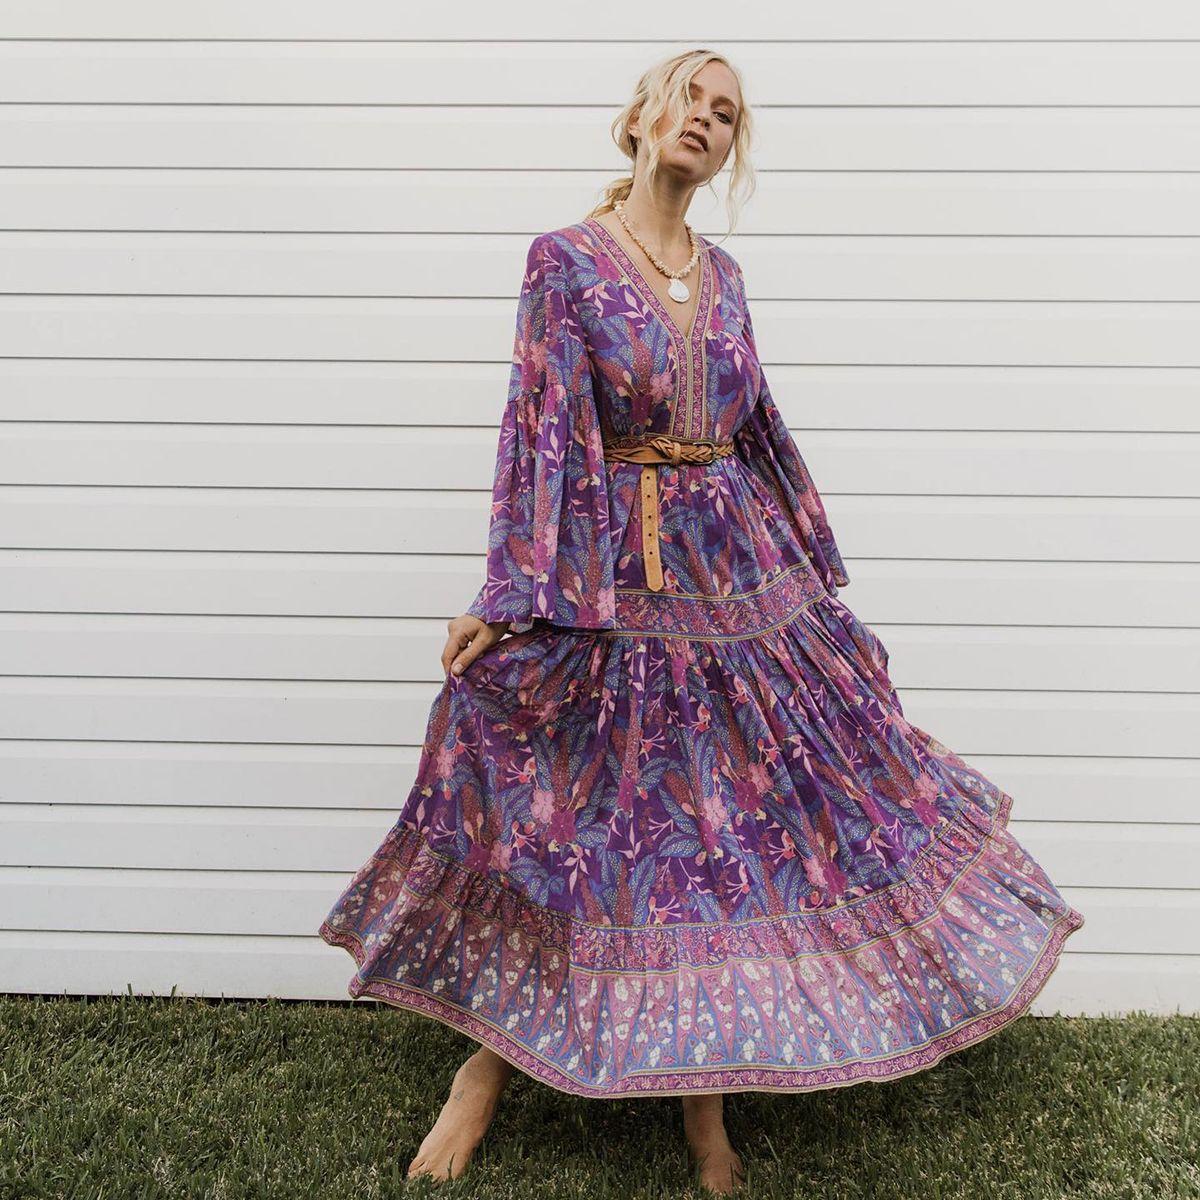 Loose Floral Printed Hippie Maxi Dress Long Sleeve V Neck Vintage Vestido Fall Summer Casual Beach Boho Women Clothes Long Dress Y200805